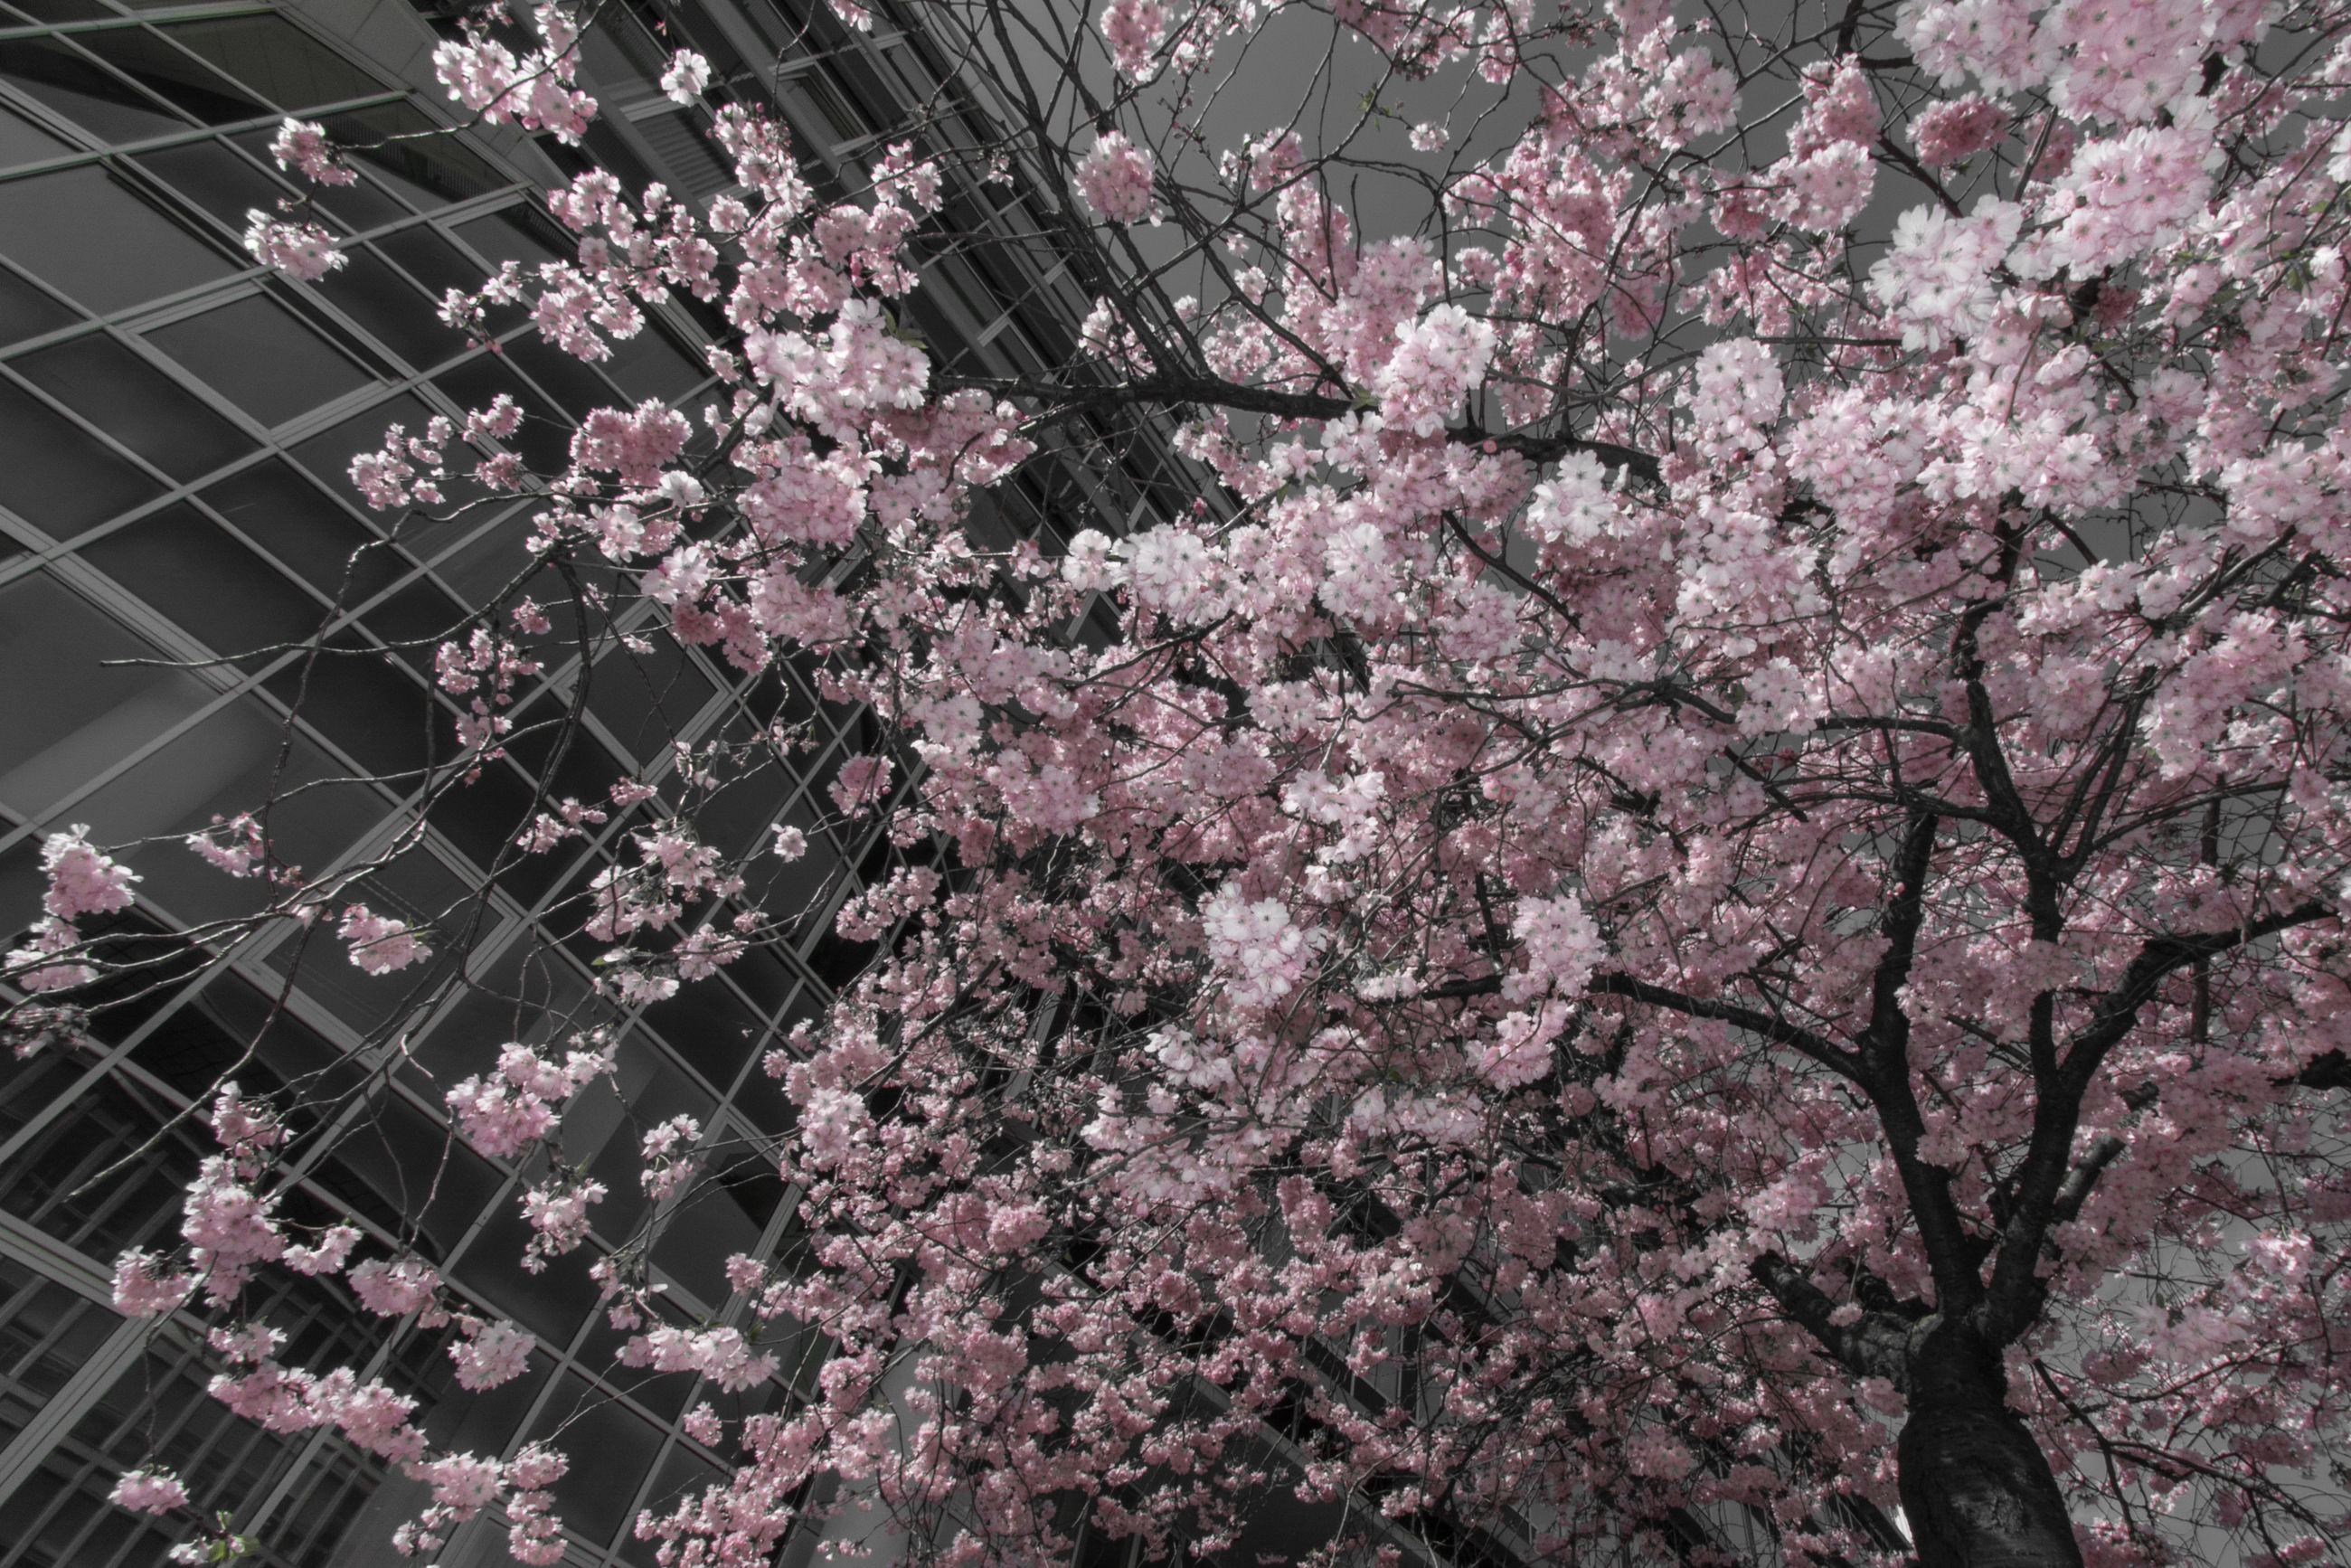 CHERRY BLOSSOM TREE IN CITY